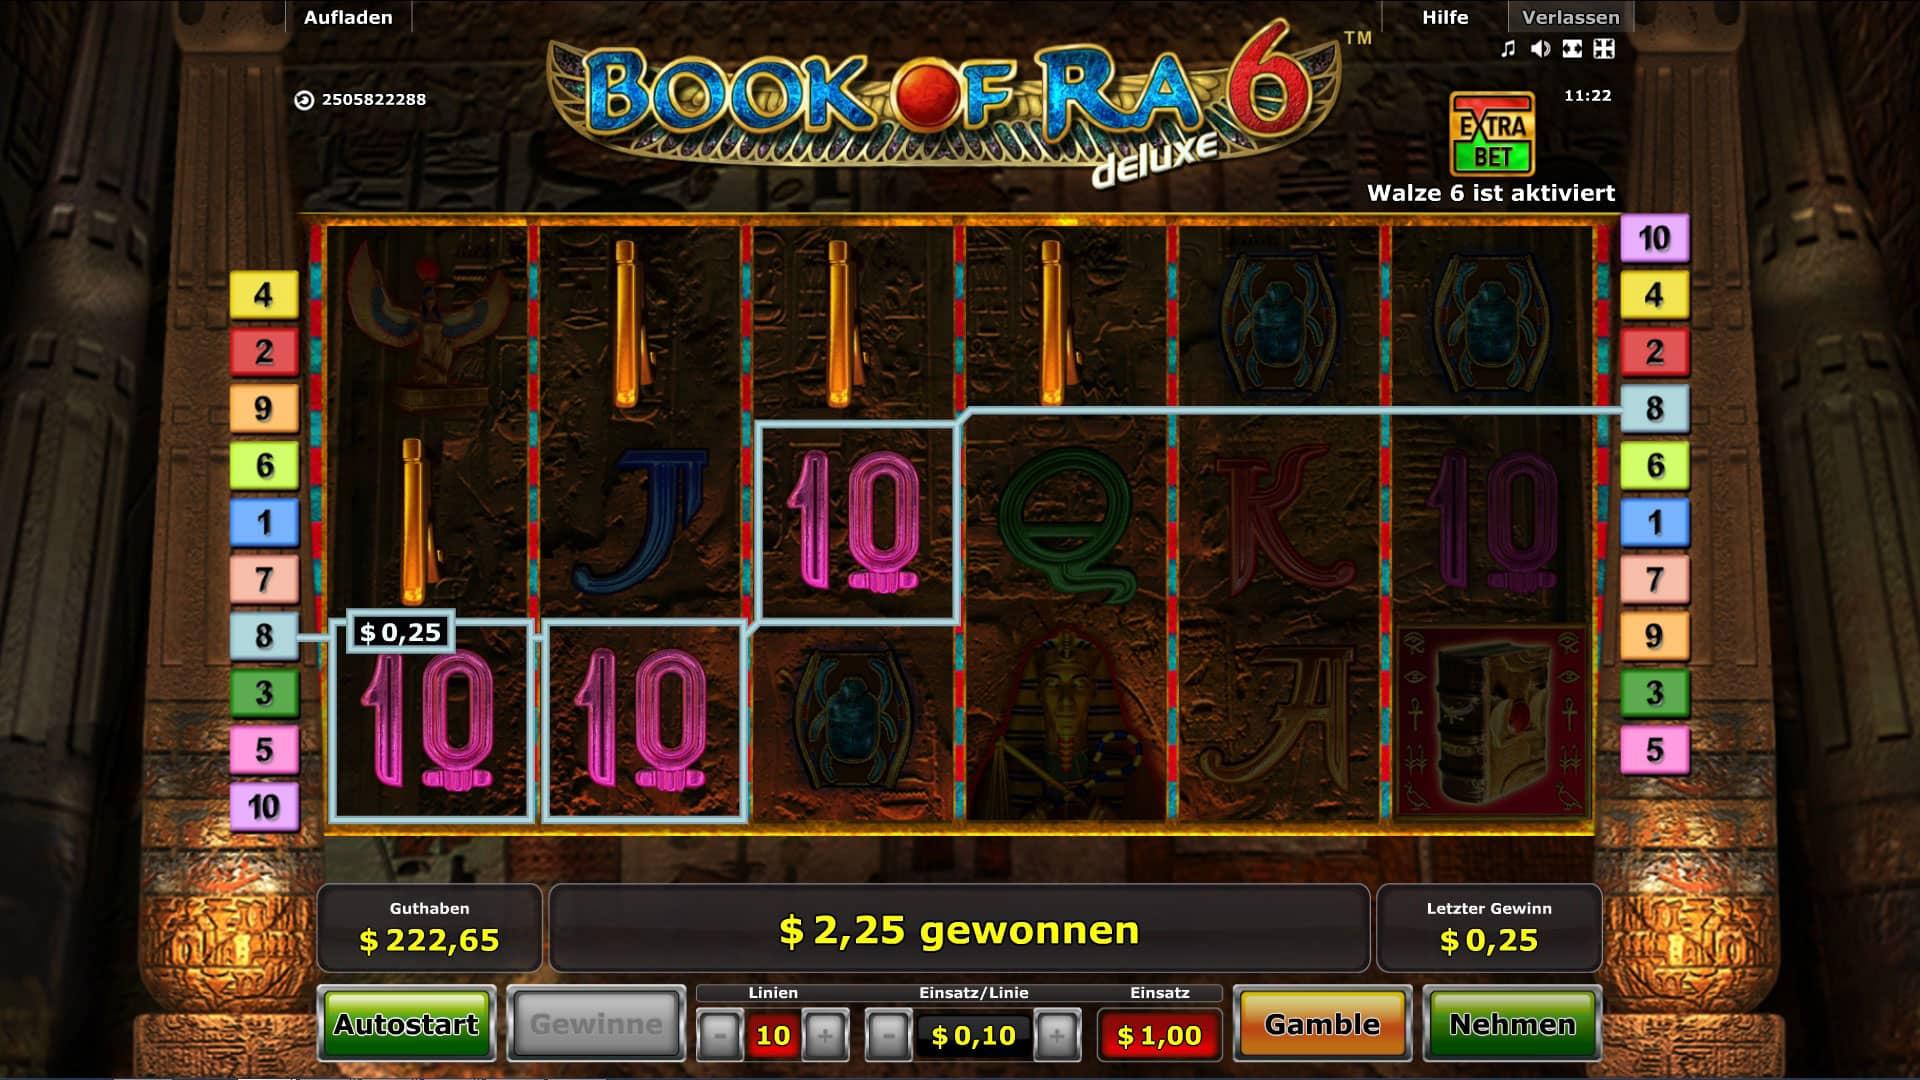 Casino Echtgeld fantasia - 368888